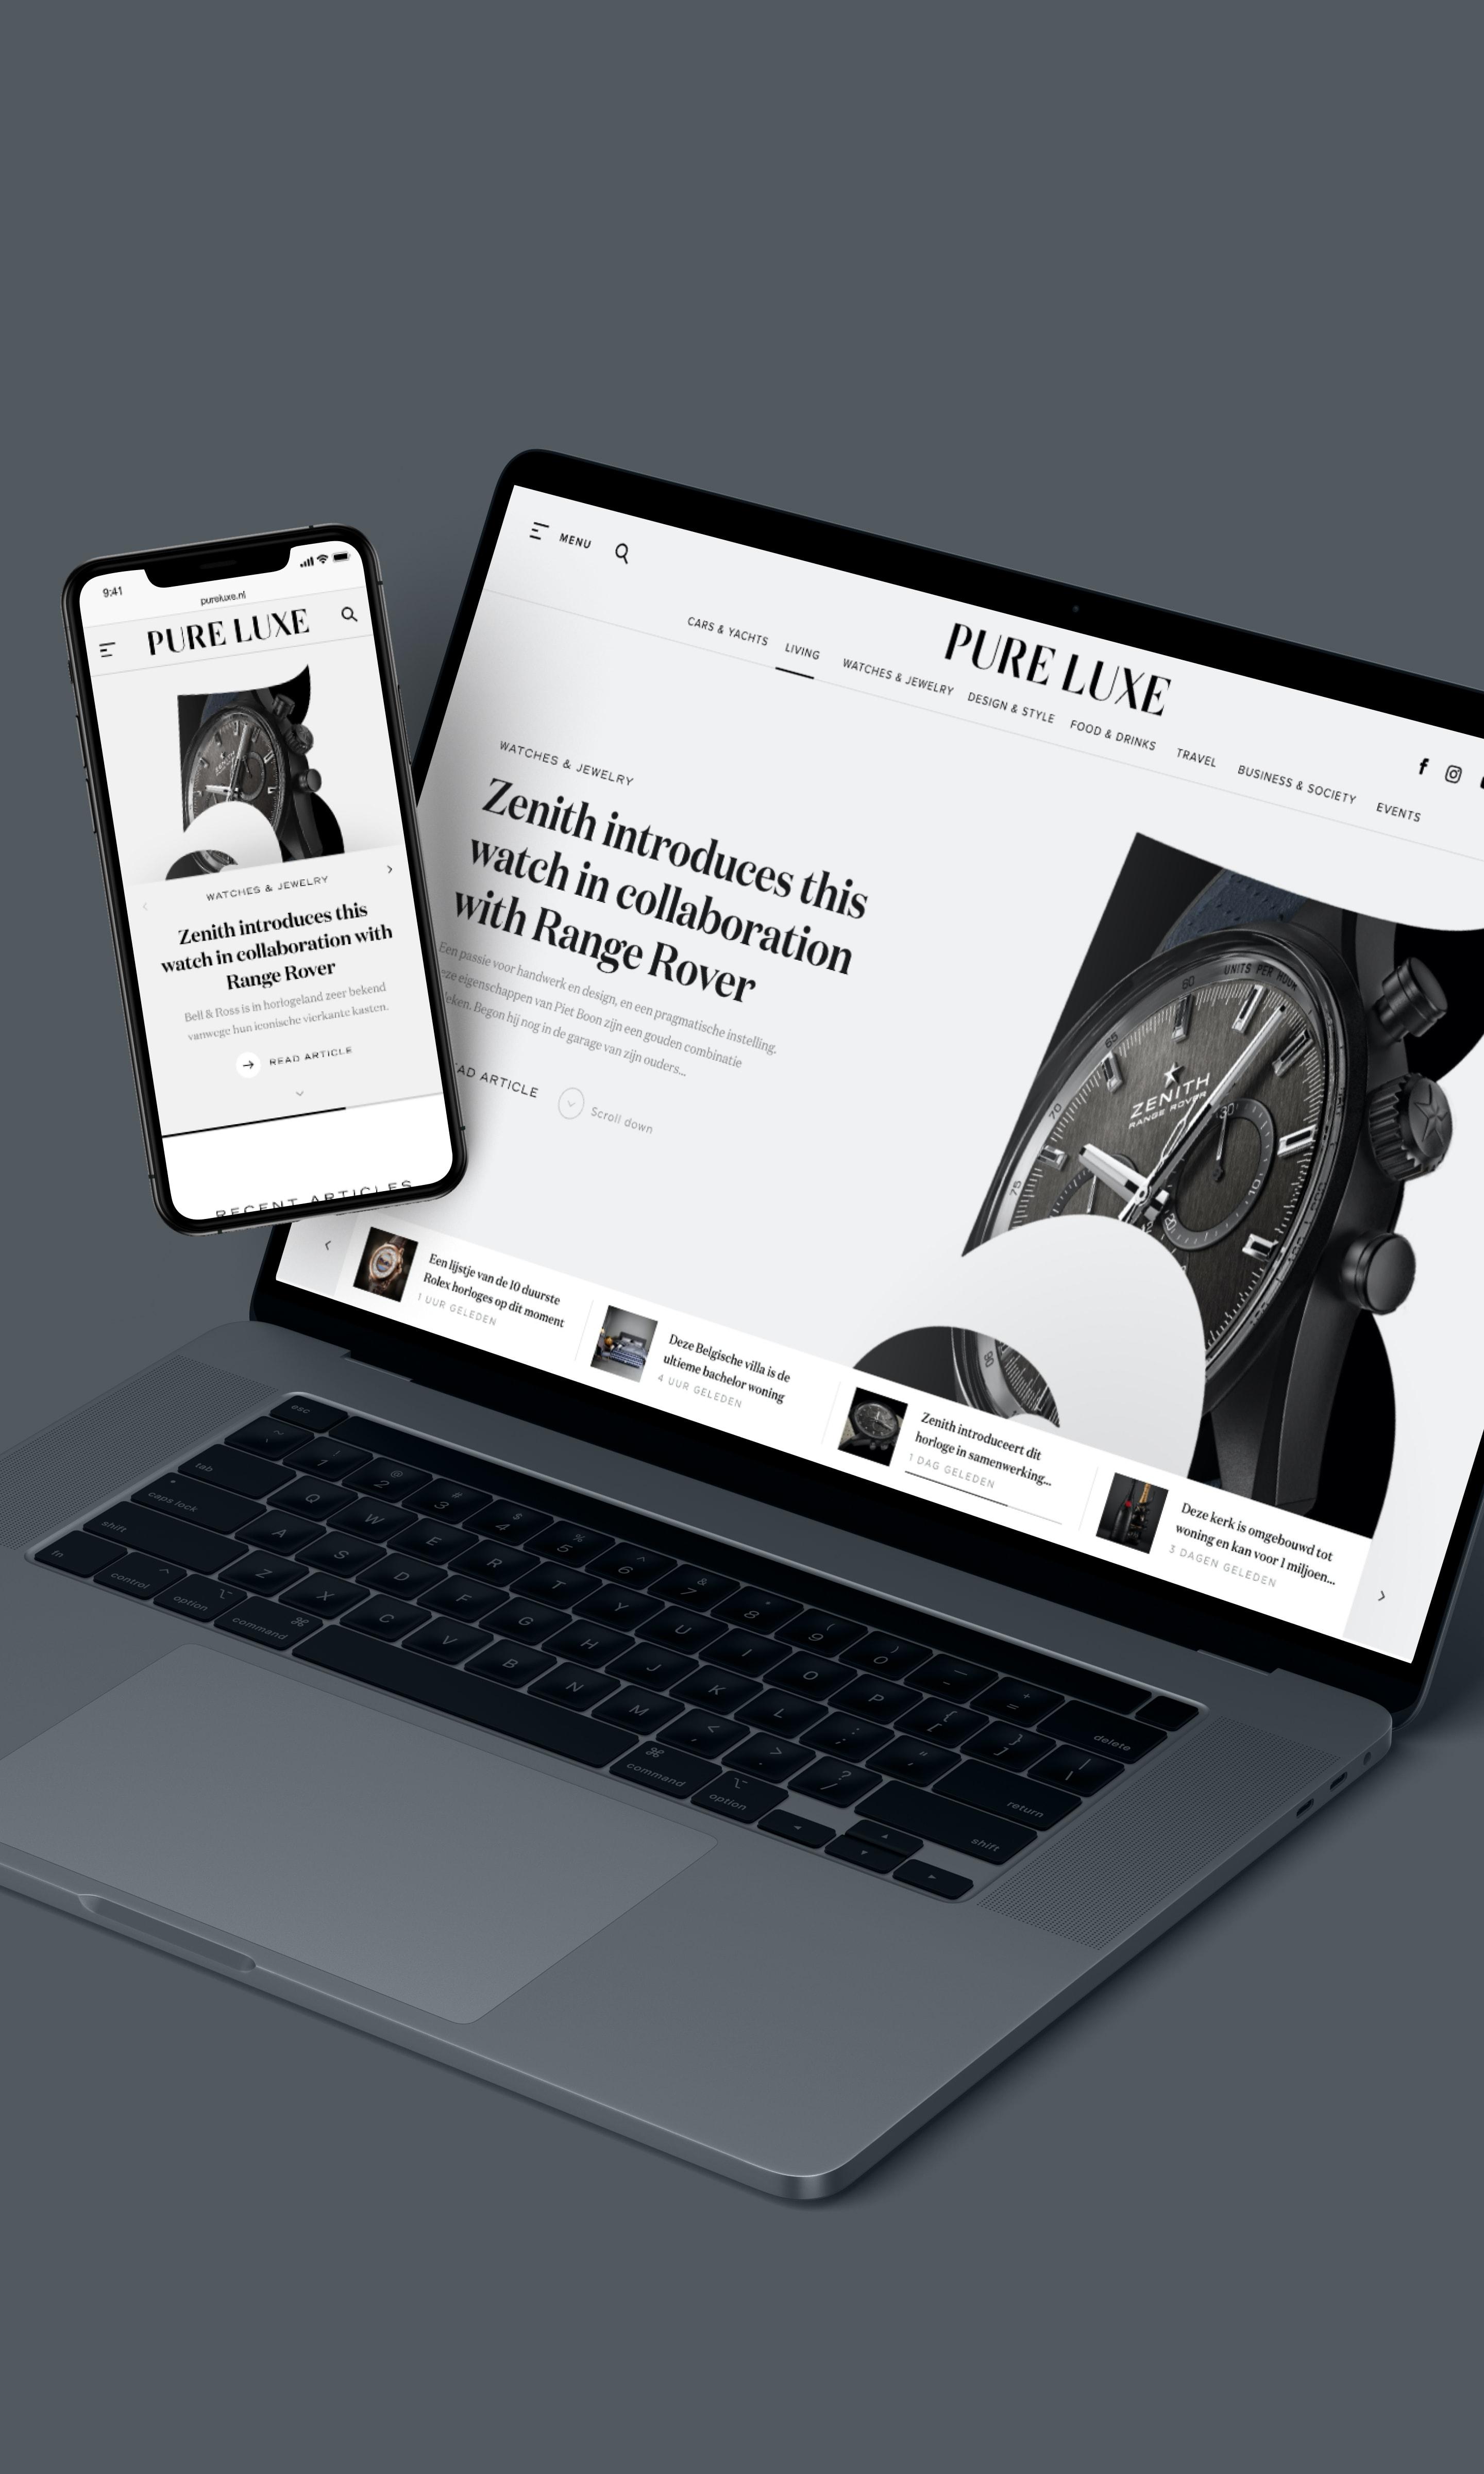 7: Designing daily digital luxury news